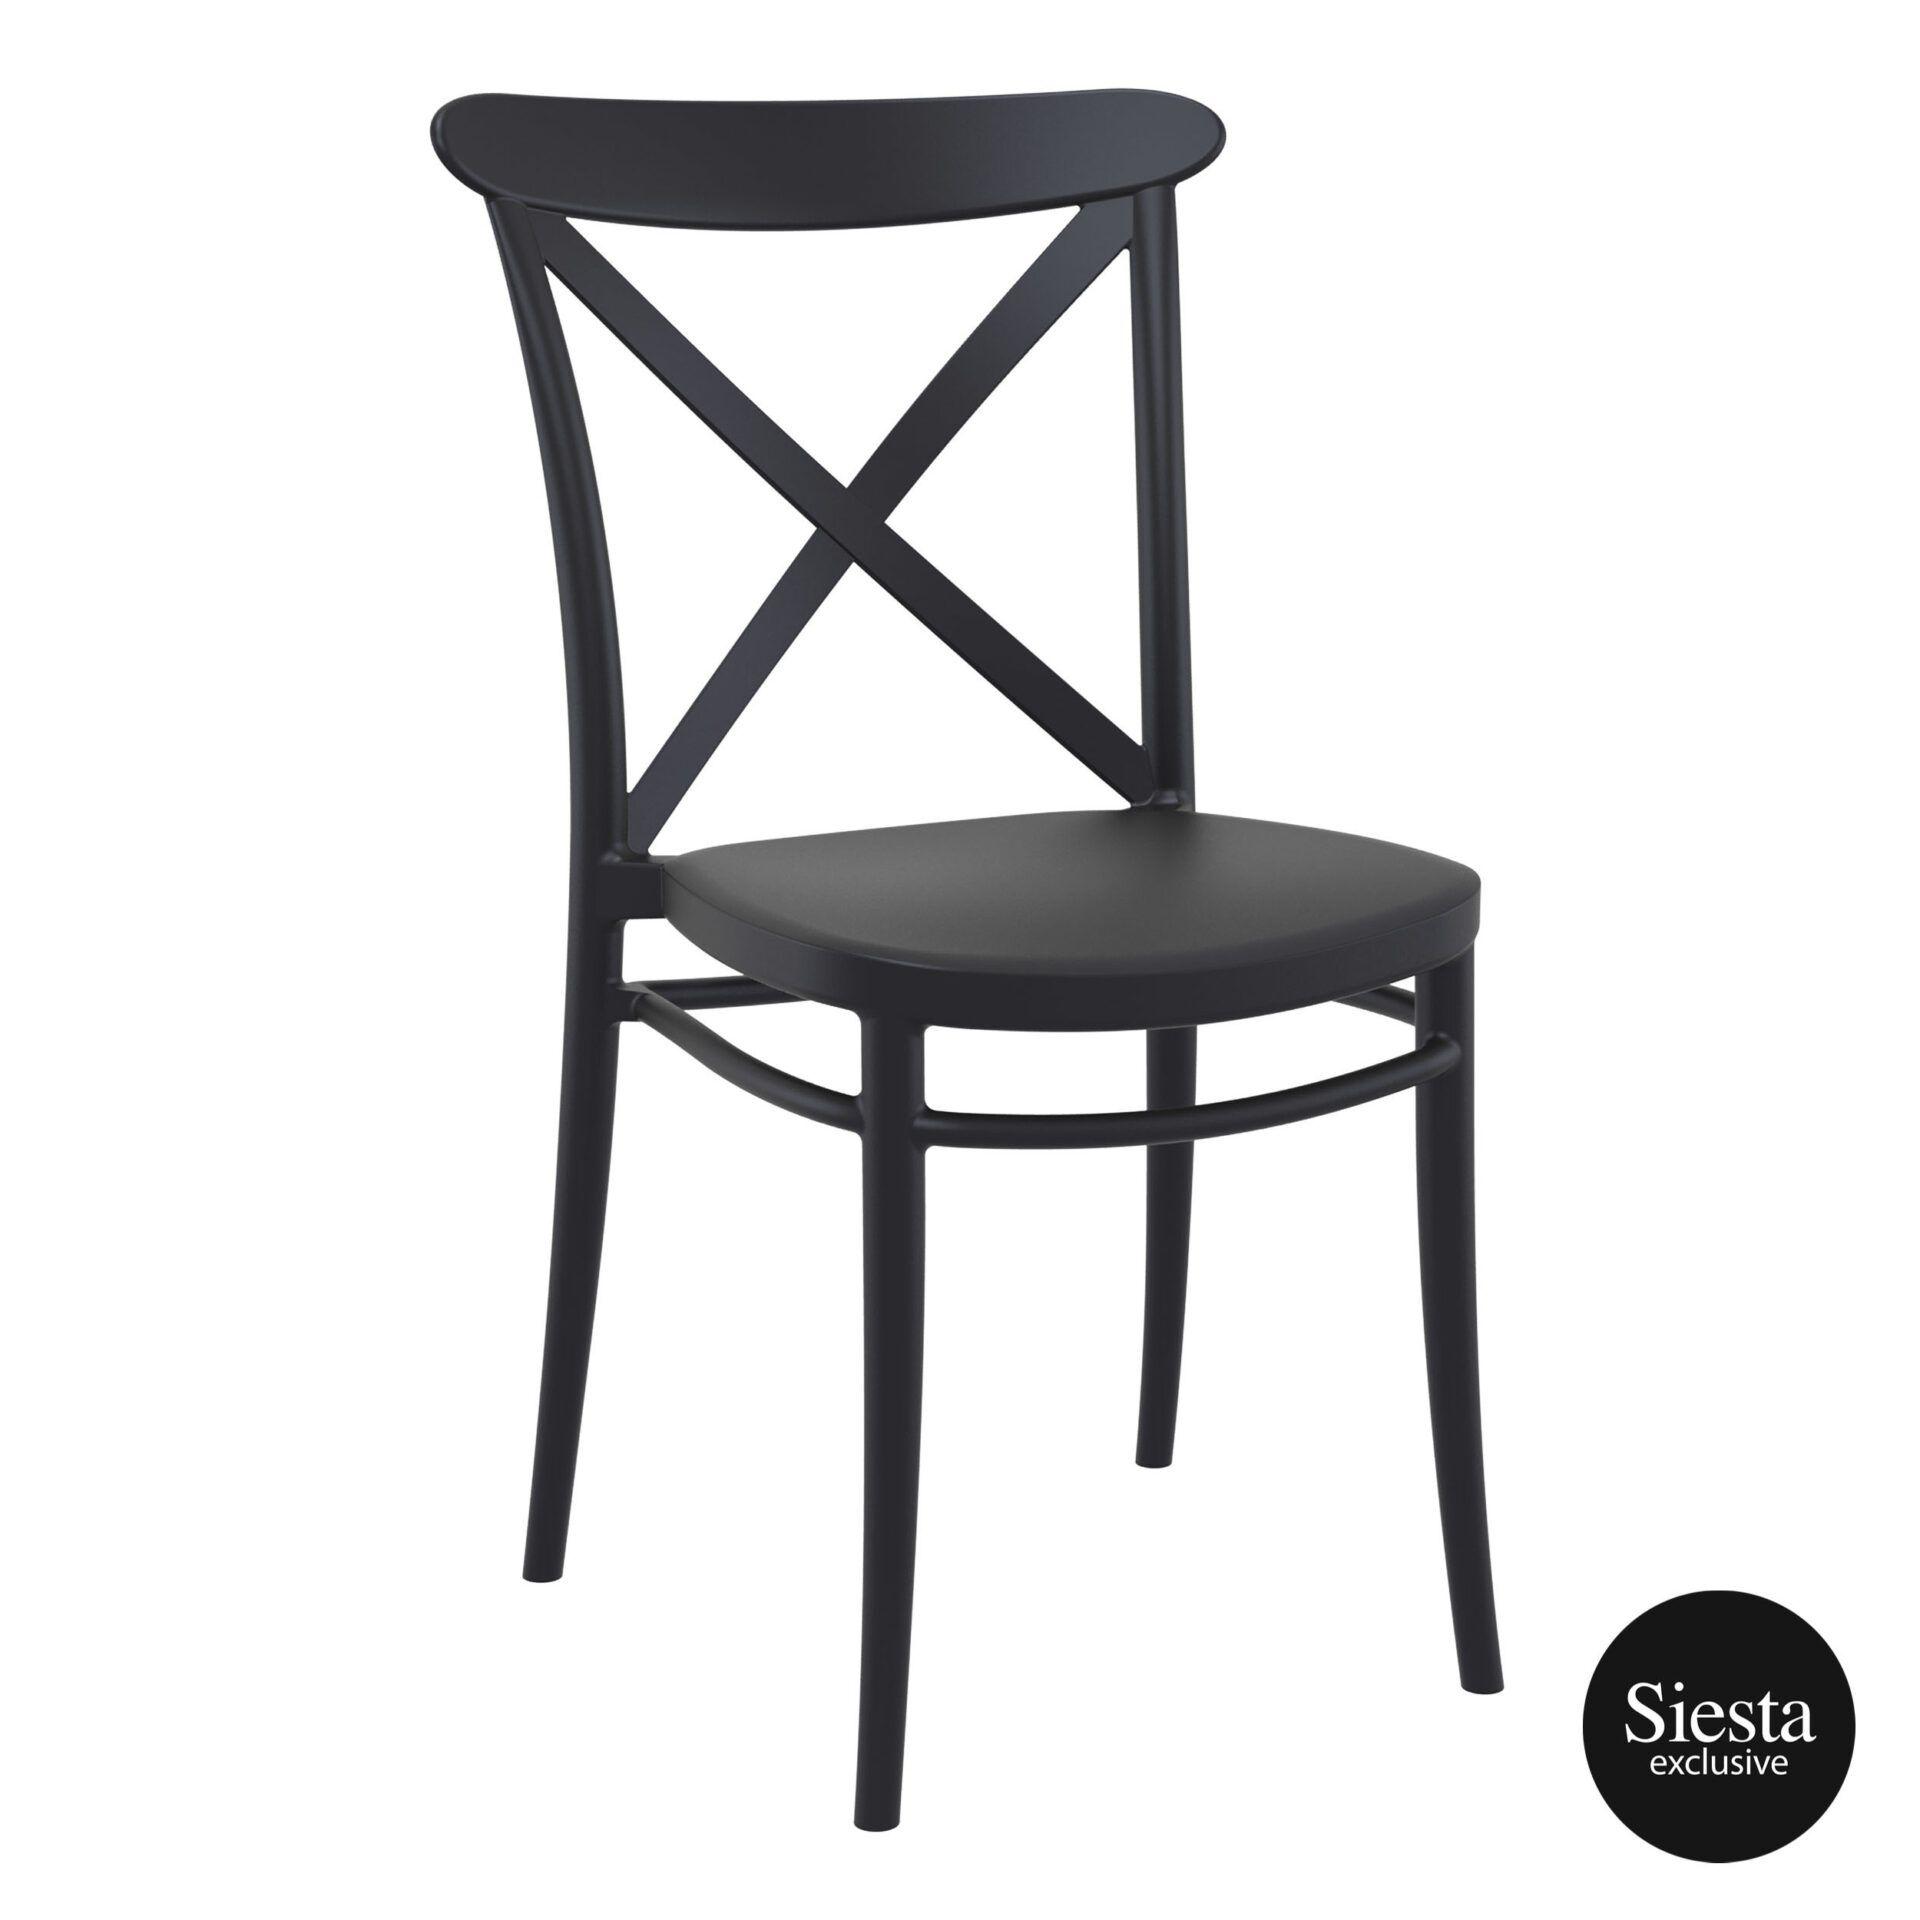 Cafe Polypropylene Cross Chair black front side